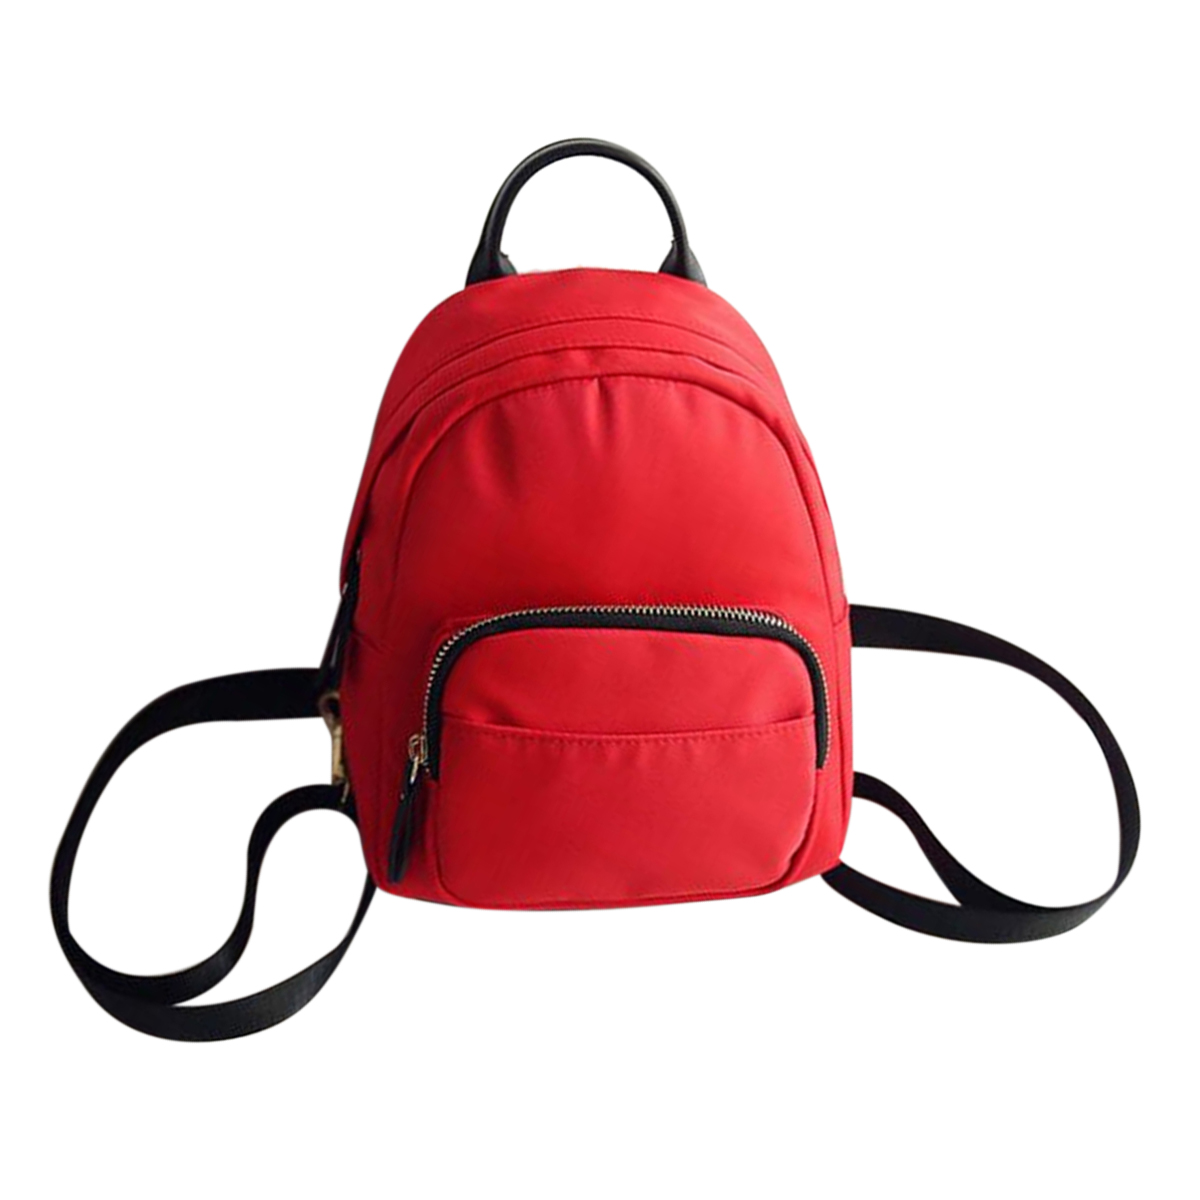 FGGS Women Backpack Nylon Shoulder School Travel Bag Small Casual Rucksack(Red)